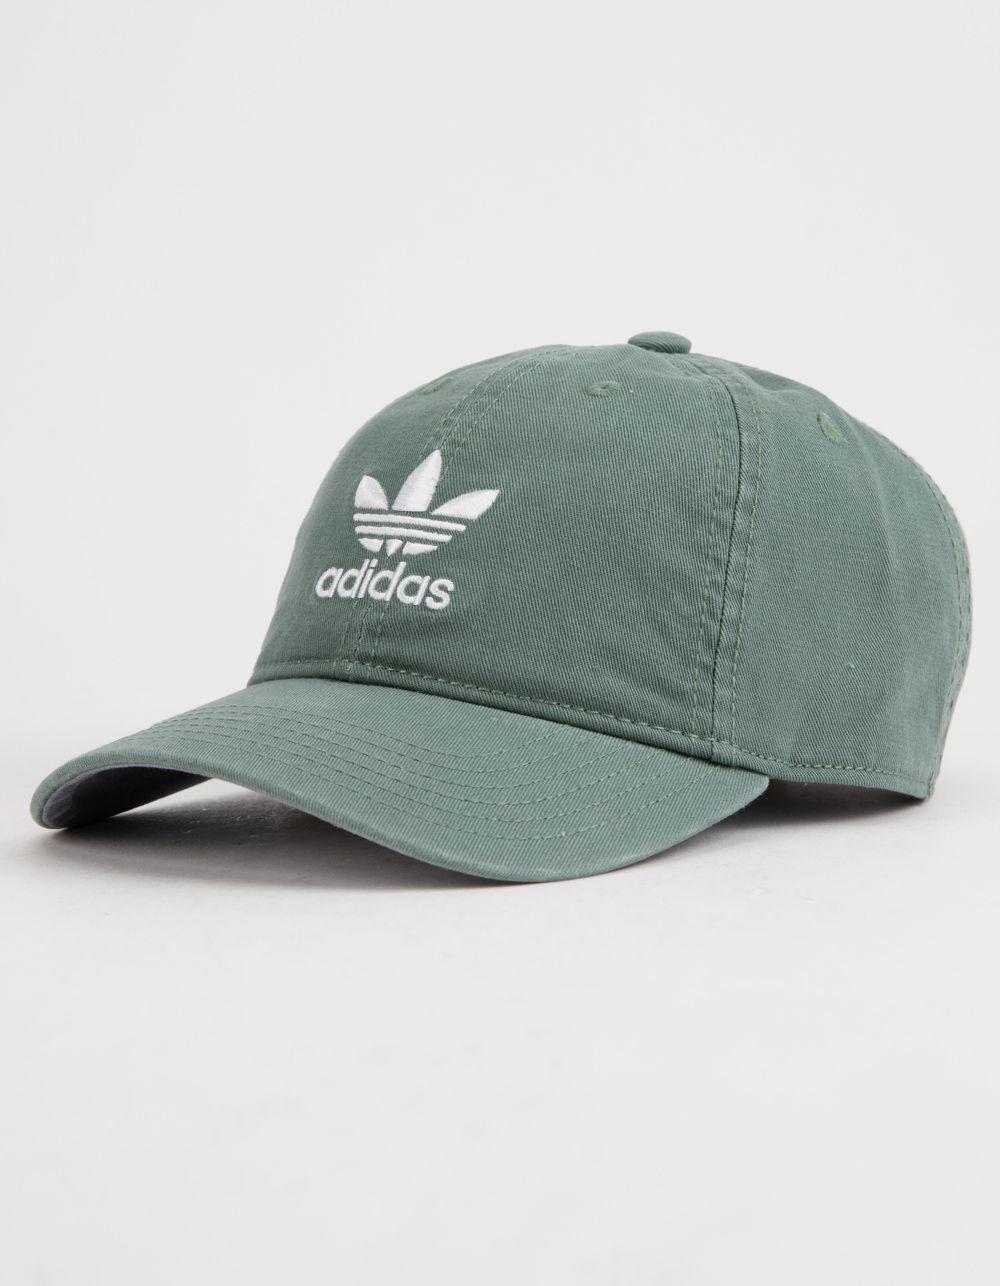 Adidas - Originals Relaxed Green Womens Strapback Hat - Lyst. View  fullscreen a77dca4945fc